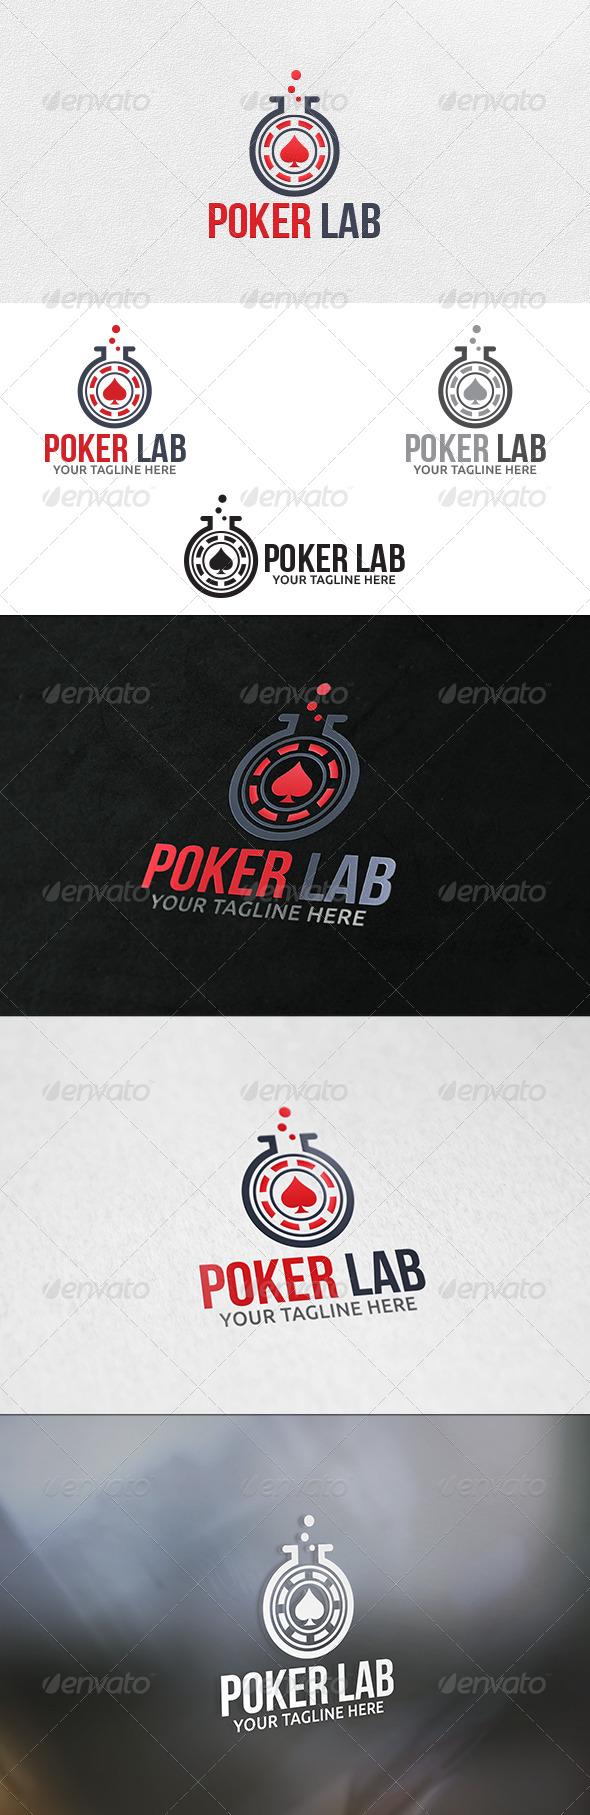 Poker Lab - Logo Template